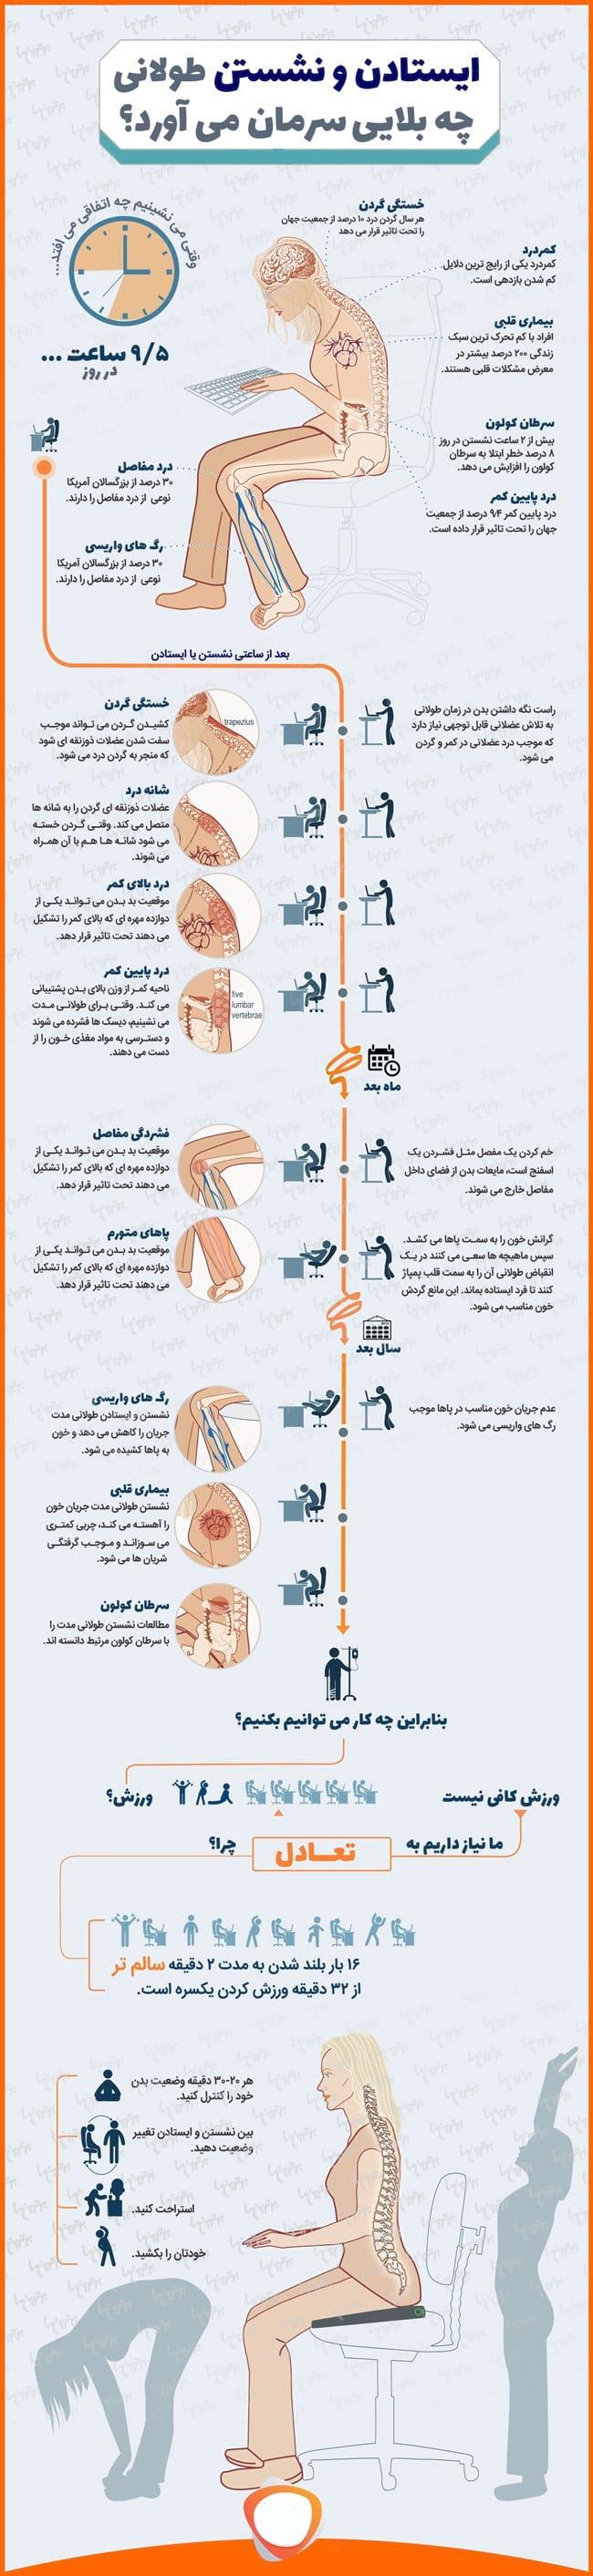 اینفوگرافی سلامتی